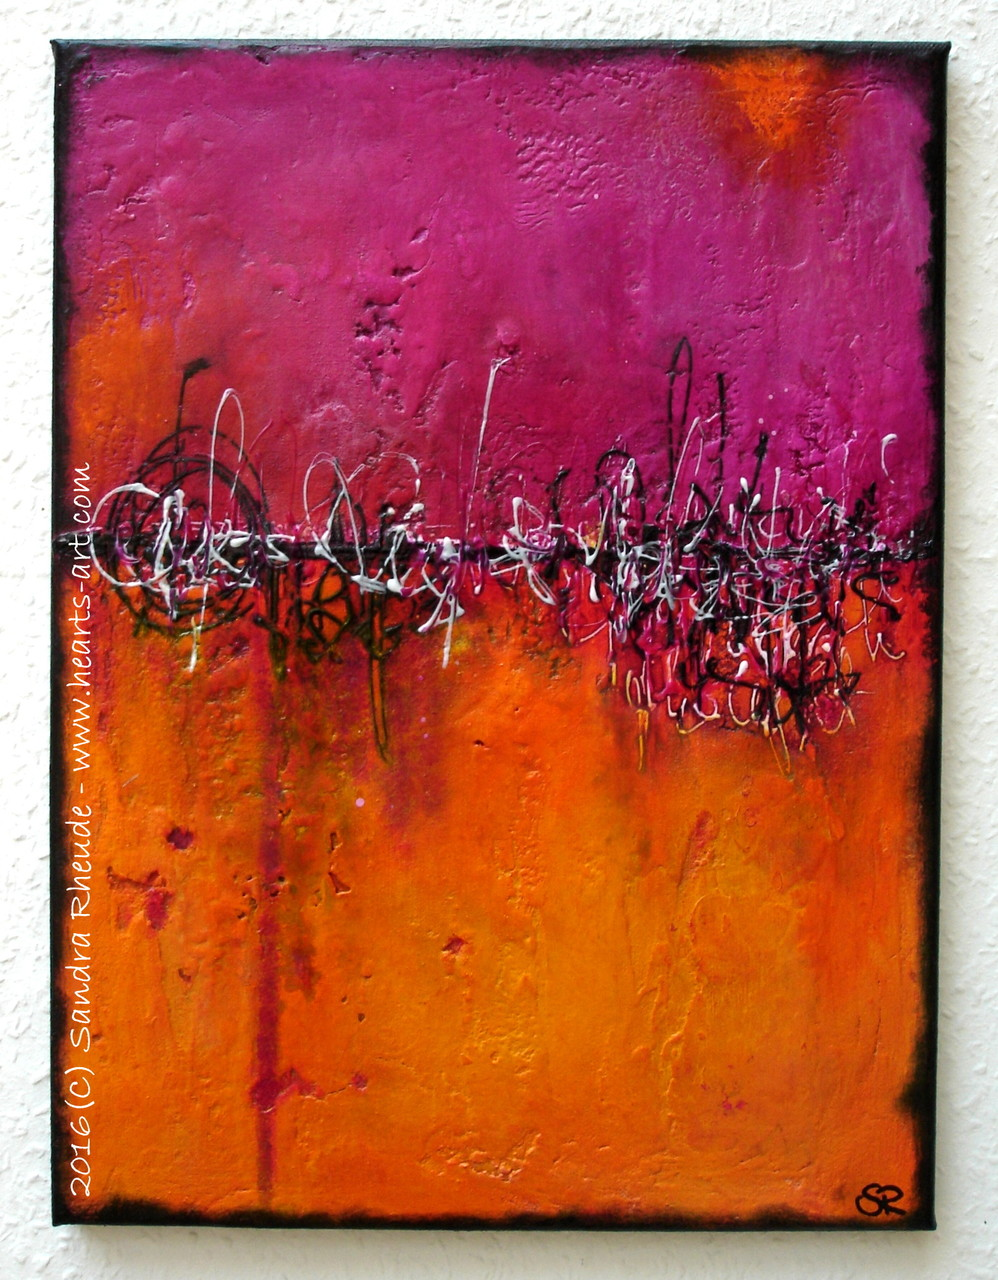 'Taste of Life' -  2016/21 - Acryl/MixedMedia auf Leinwand - 30 x 40 cm - € 220